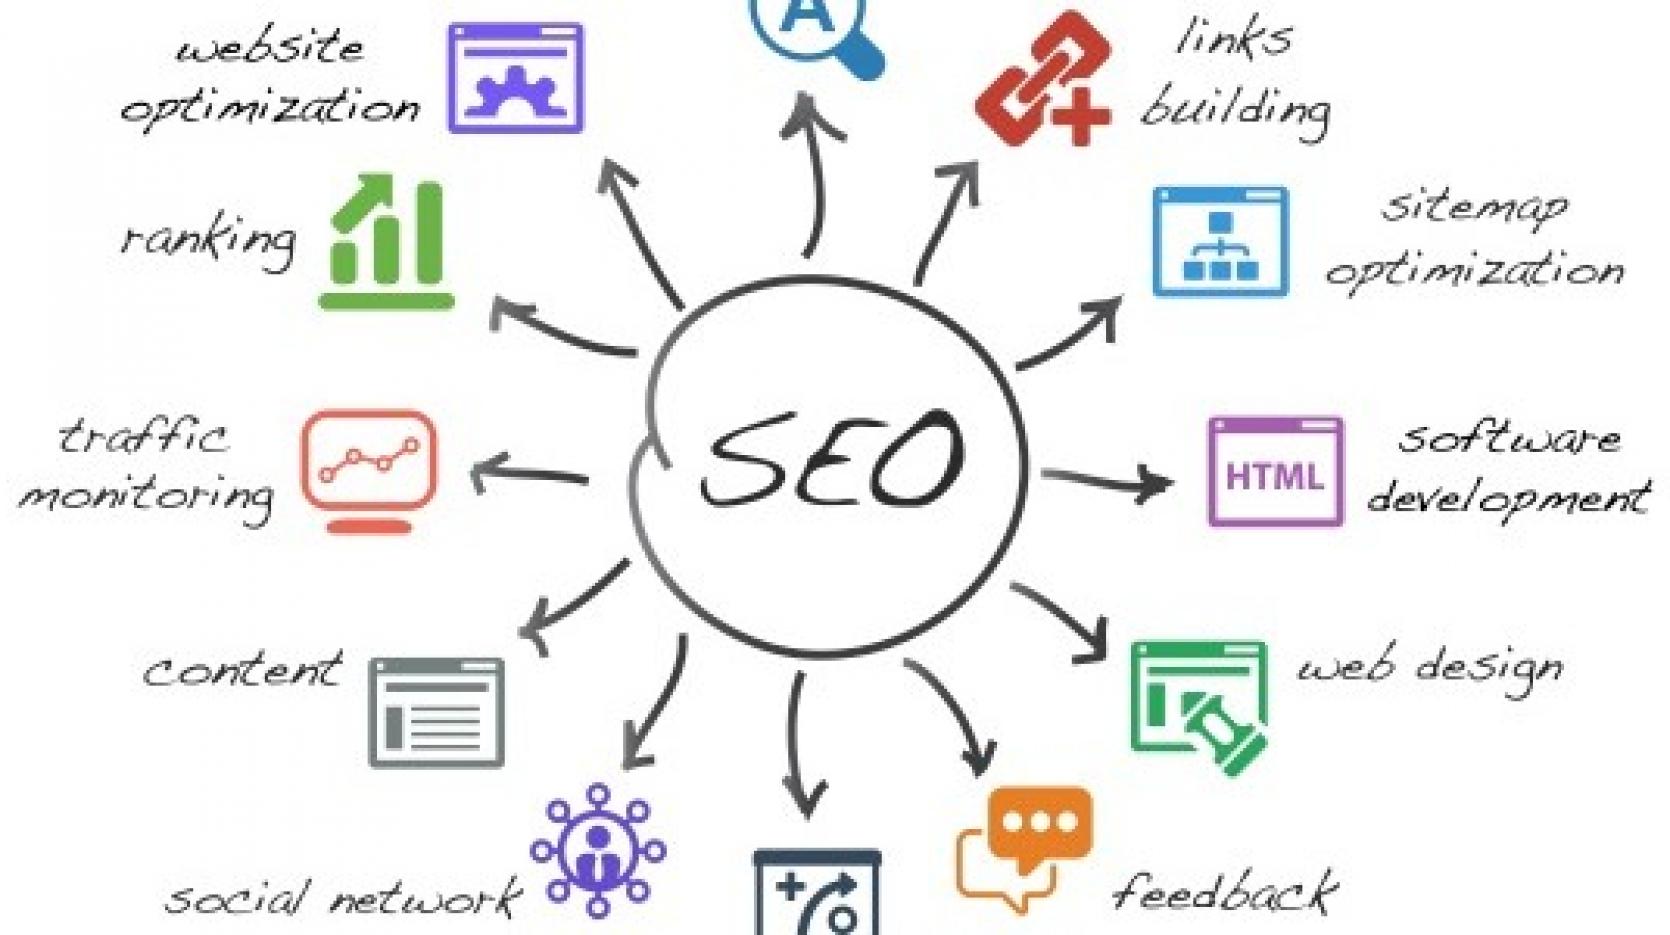 seo-process-search-engine-optimization-jon-rognerud-580x300